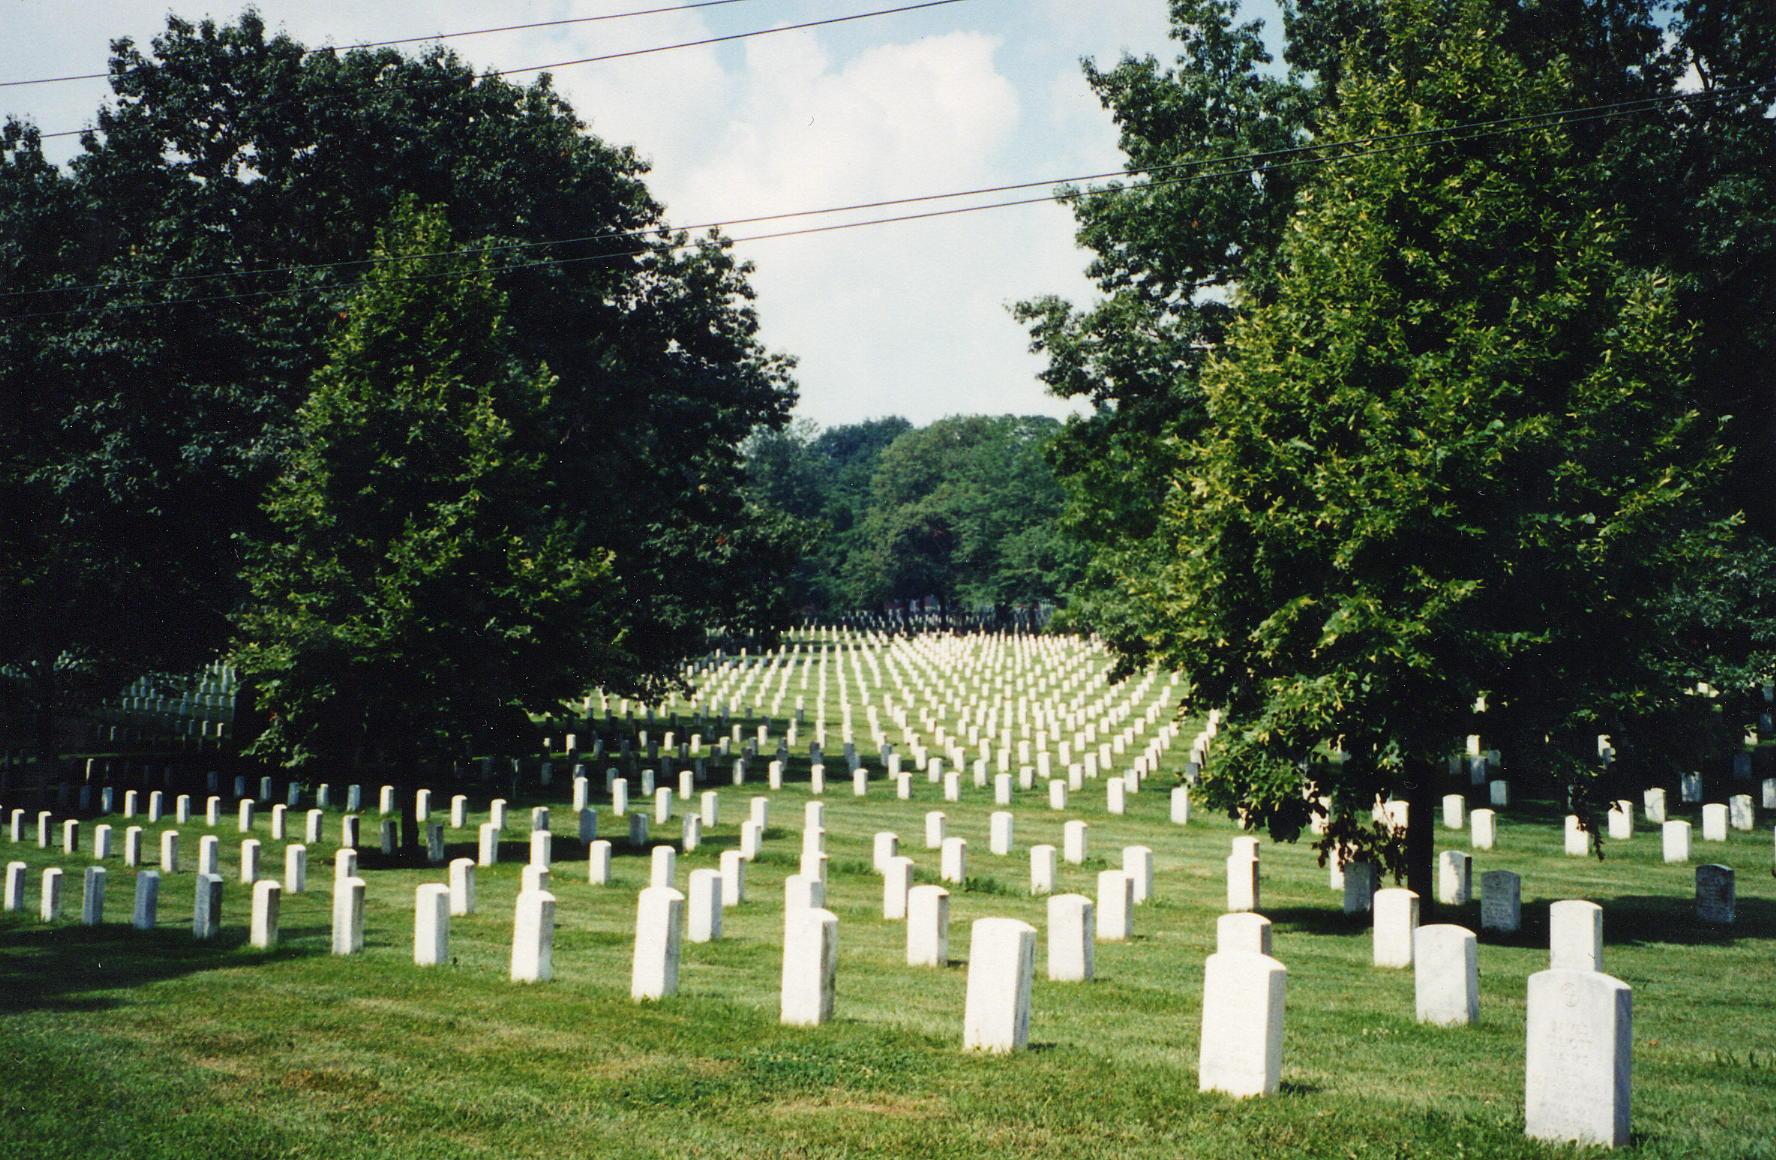 pics photos cemetery - photo #36